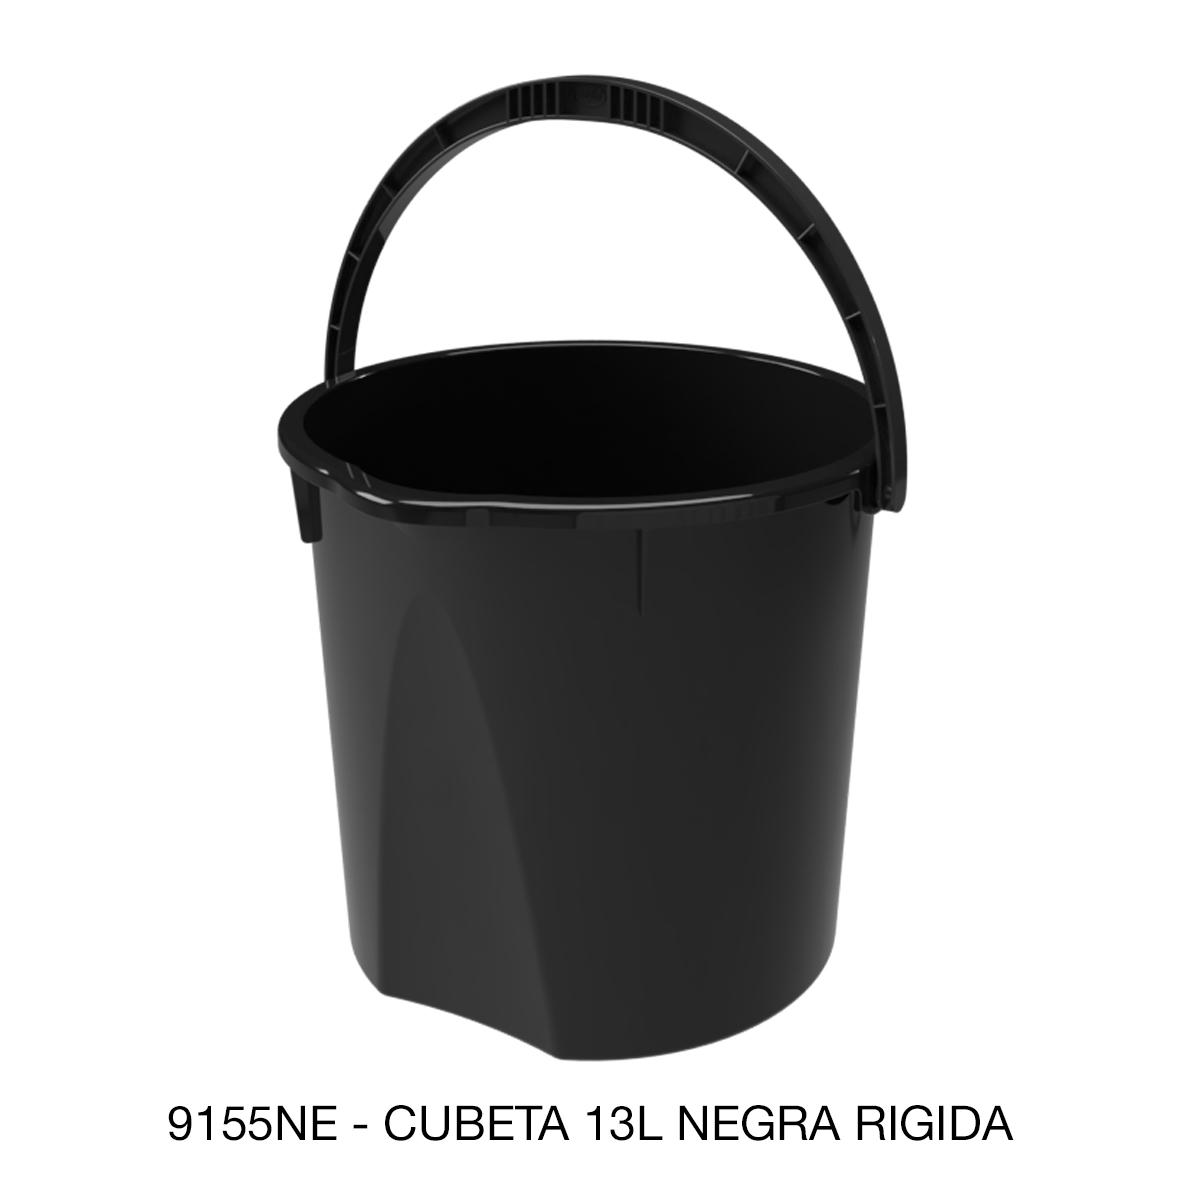 Cubeta rígida de 13 litros color nero modelo 9155NE de Sablón